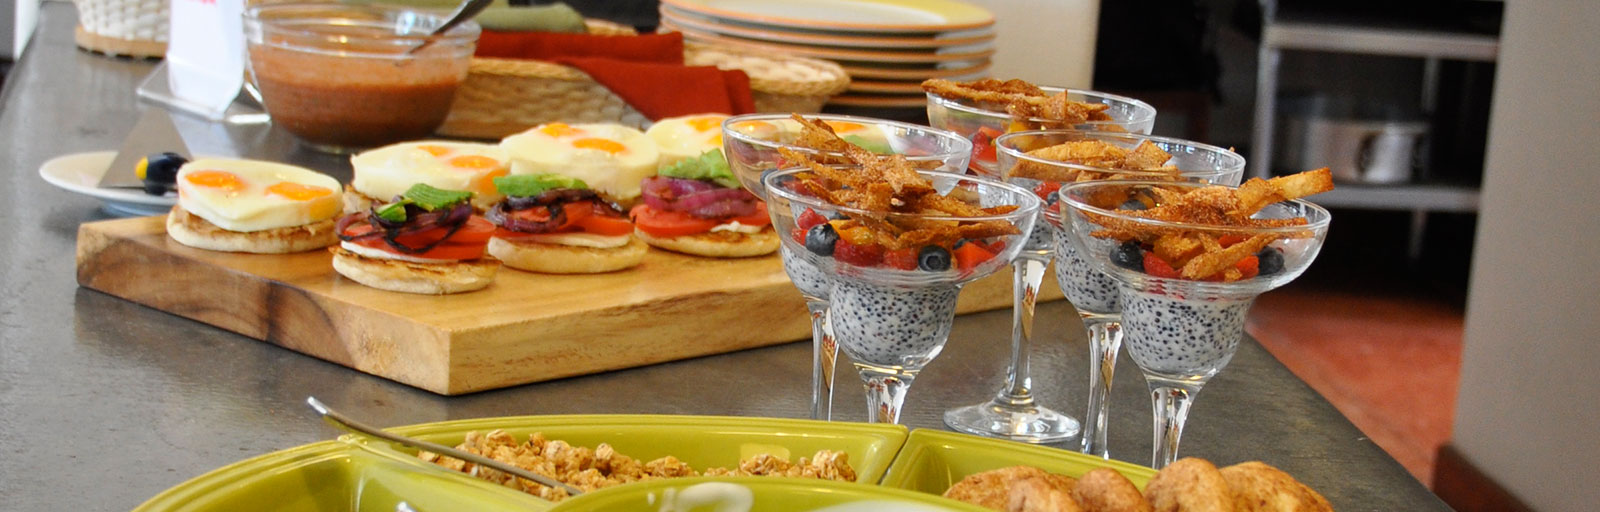 Yoga Retreat Cuisine: Delicious, Healthful Food